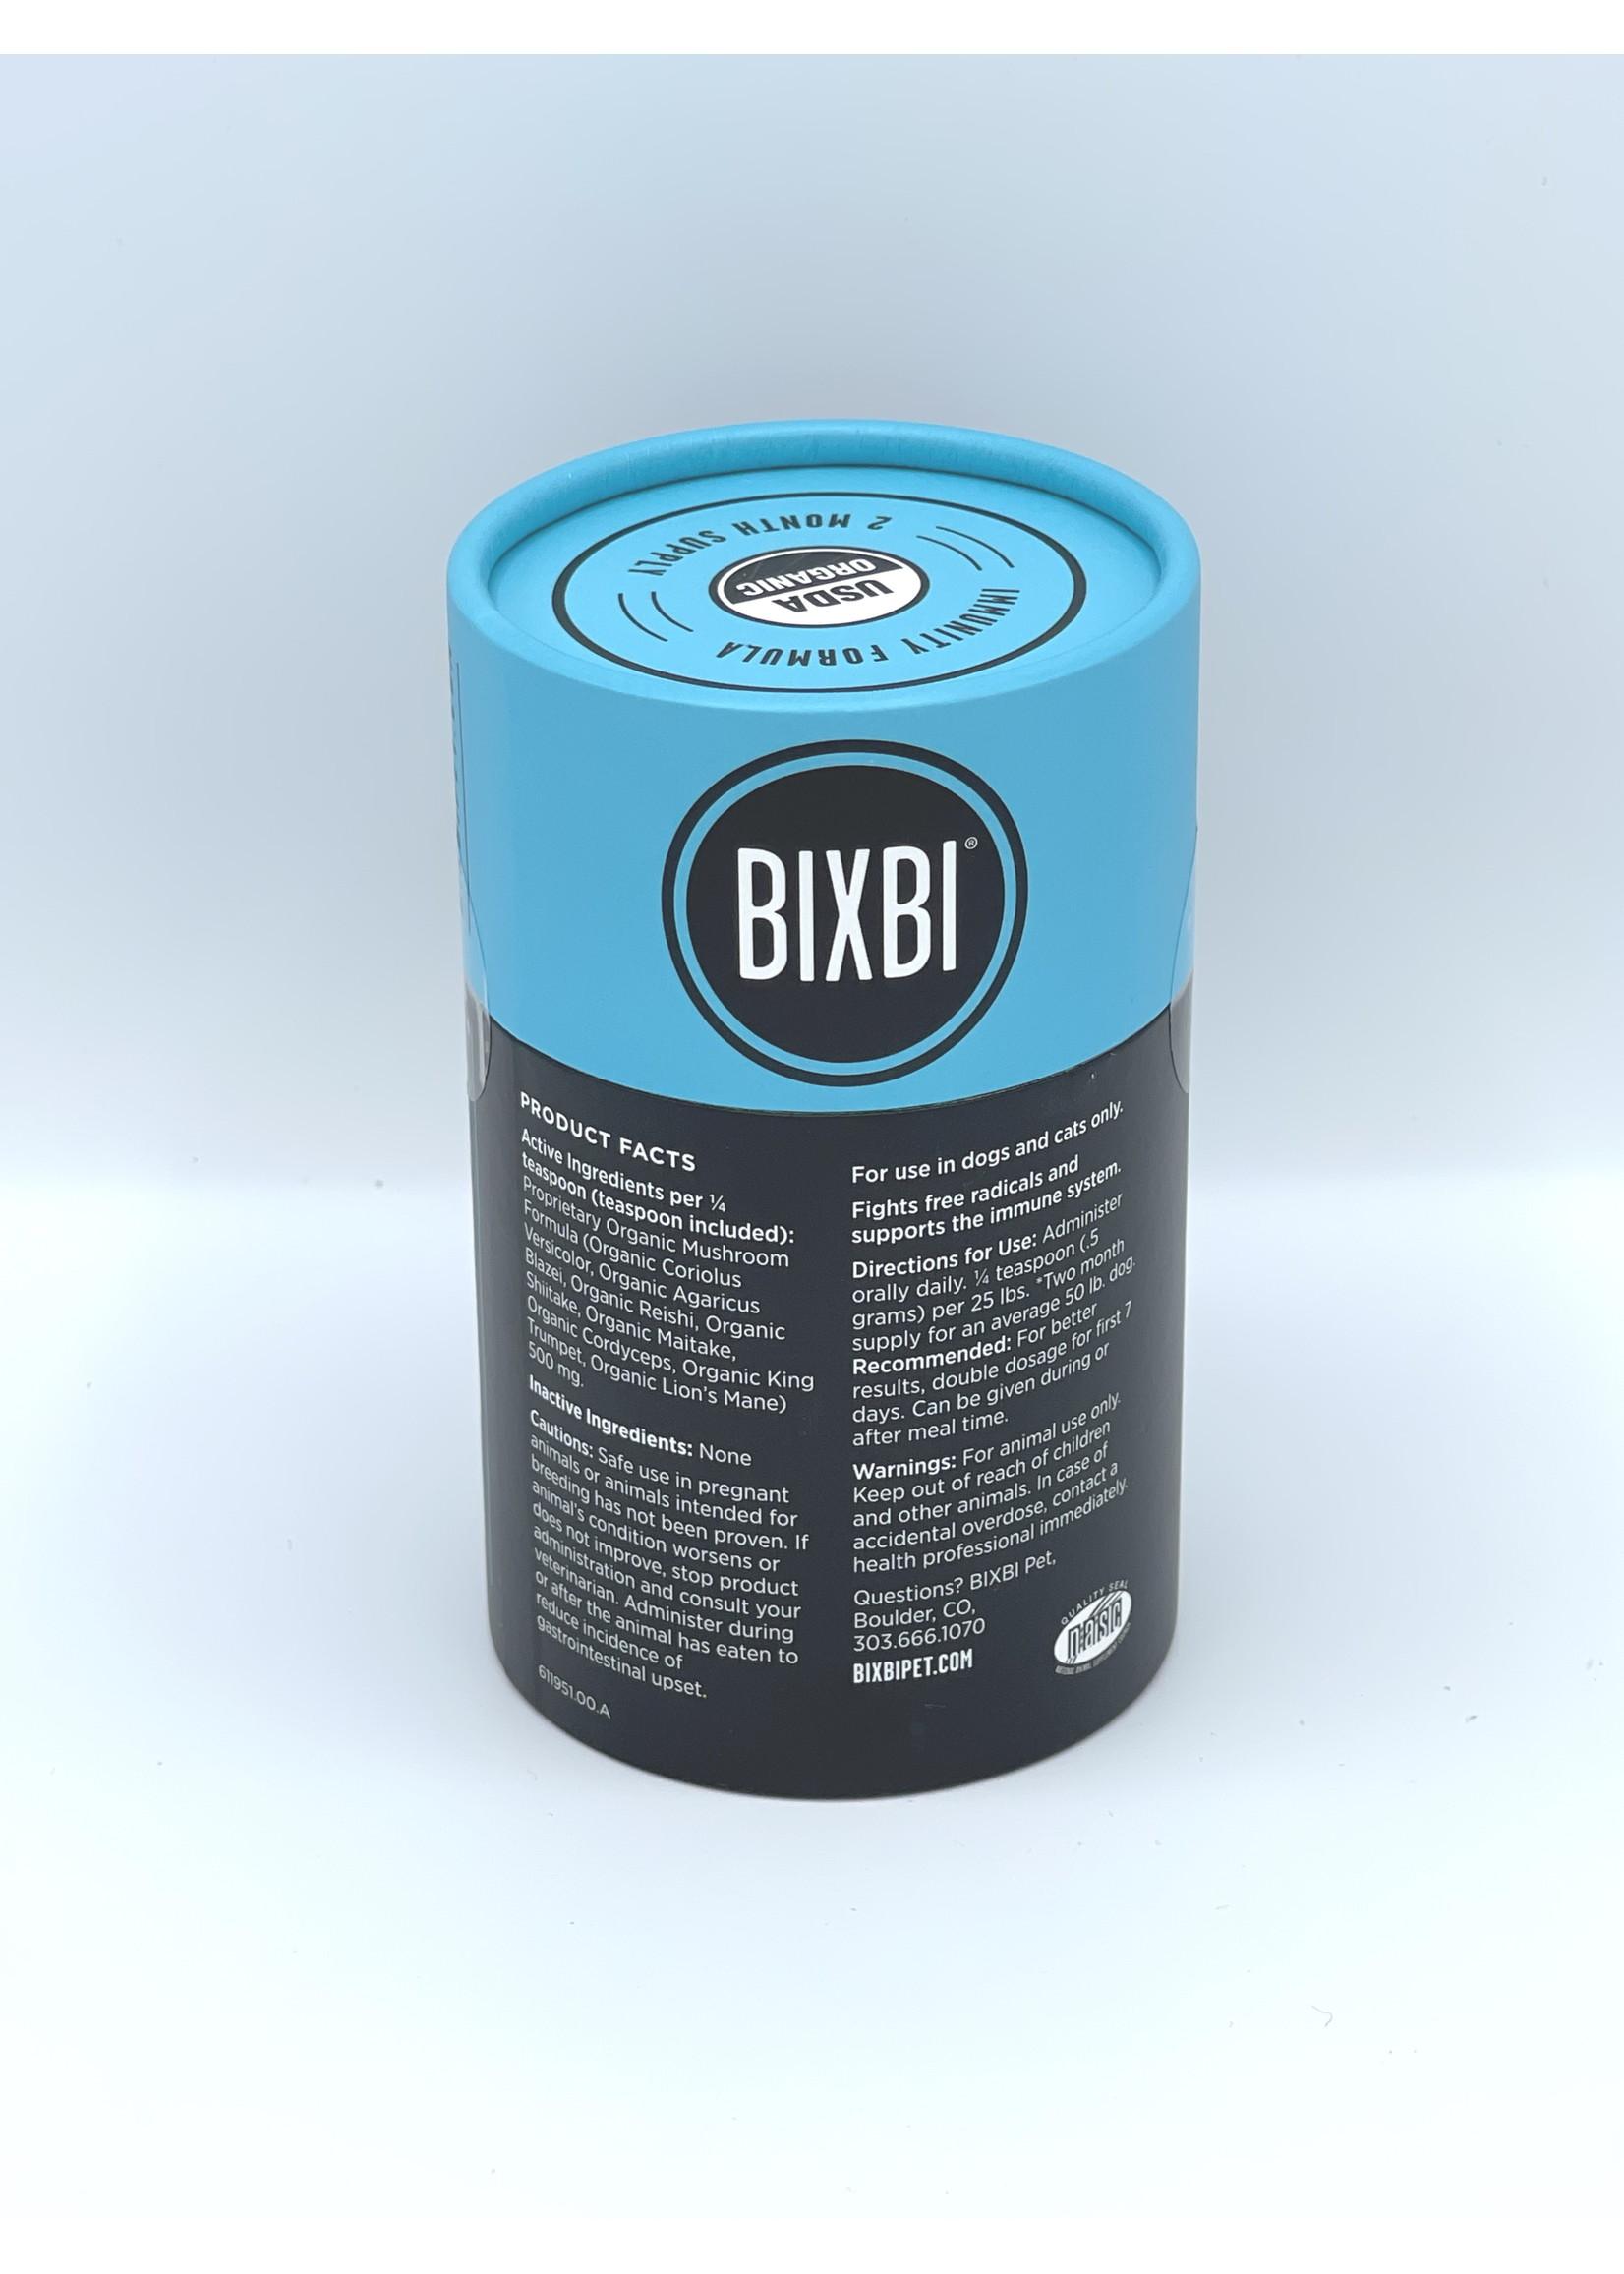 Bixbi Bixbi Cat and Dog Immunity Support Powder Supplement